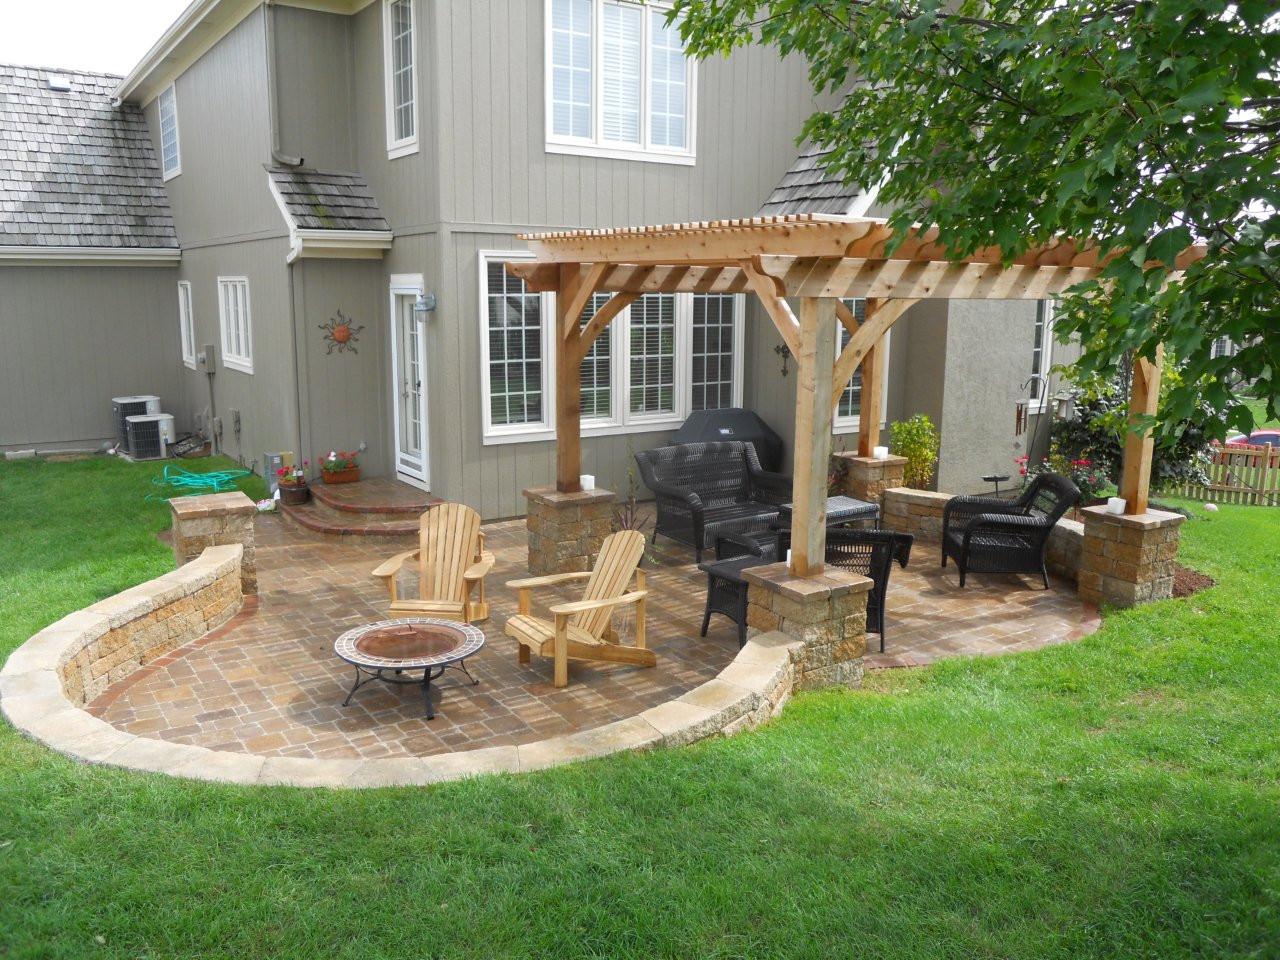 Outdoor Landscape Pavers  Flagstone Patio Pavers Design Ideas For Backyard Patio